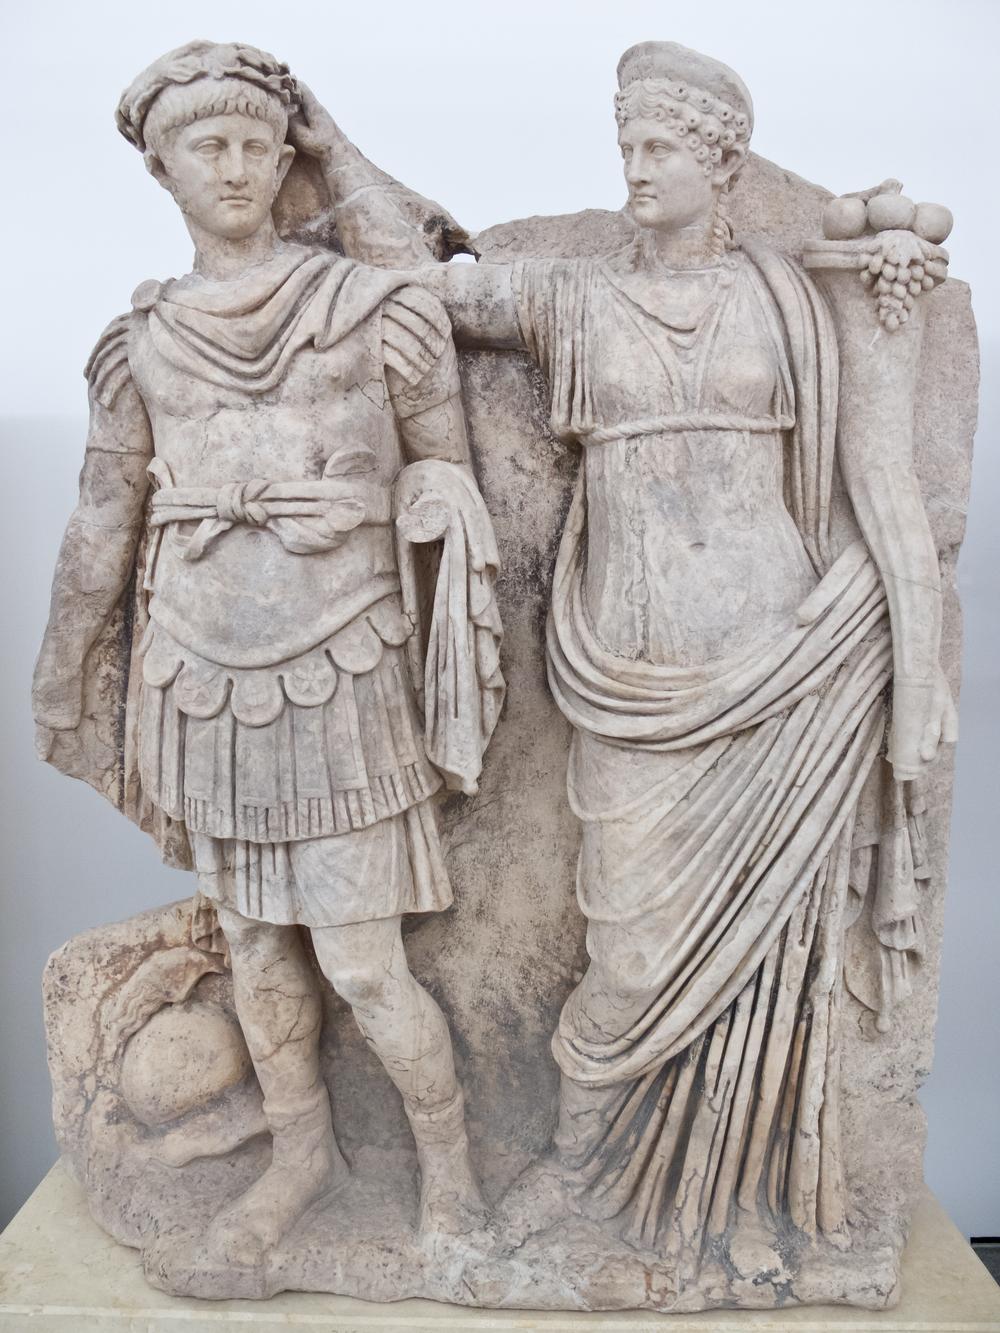 Mama's boy: Agrippina crowns son Nero emperor, the year 54. Museum in Aphrodisias, Turkey.